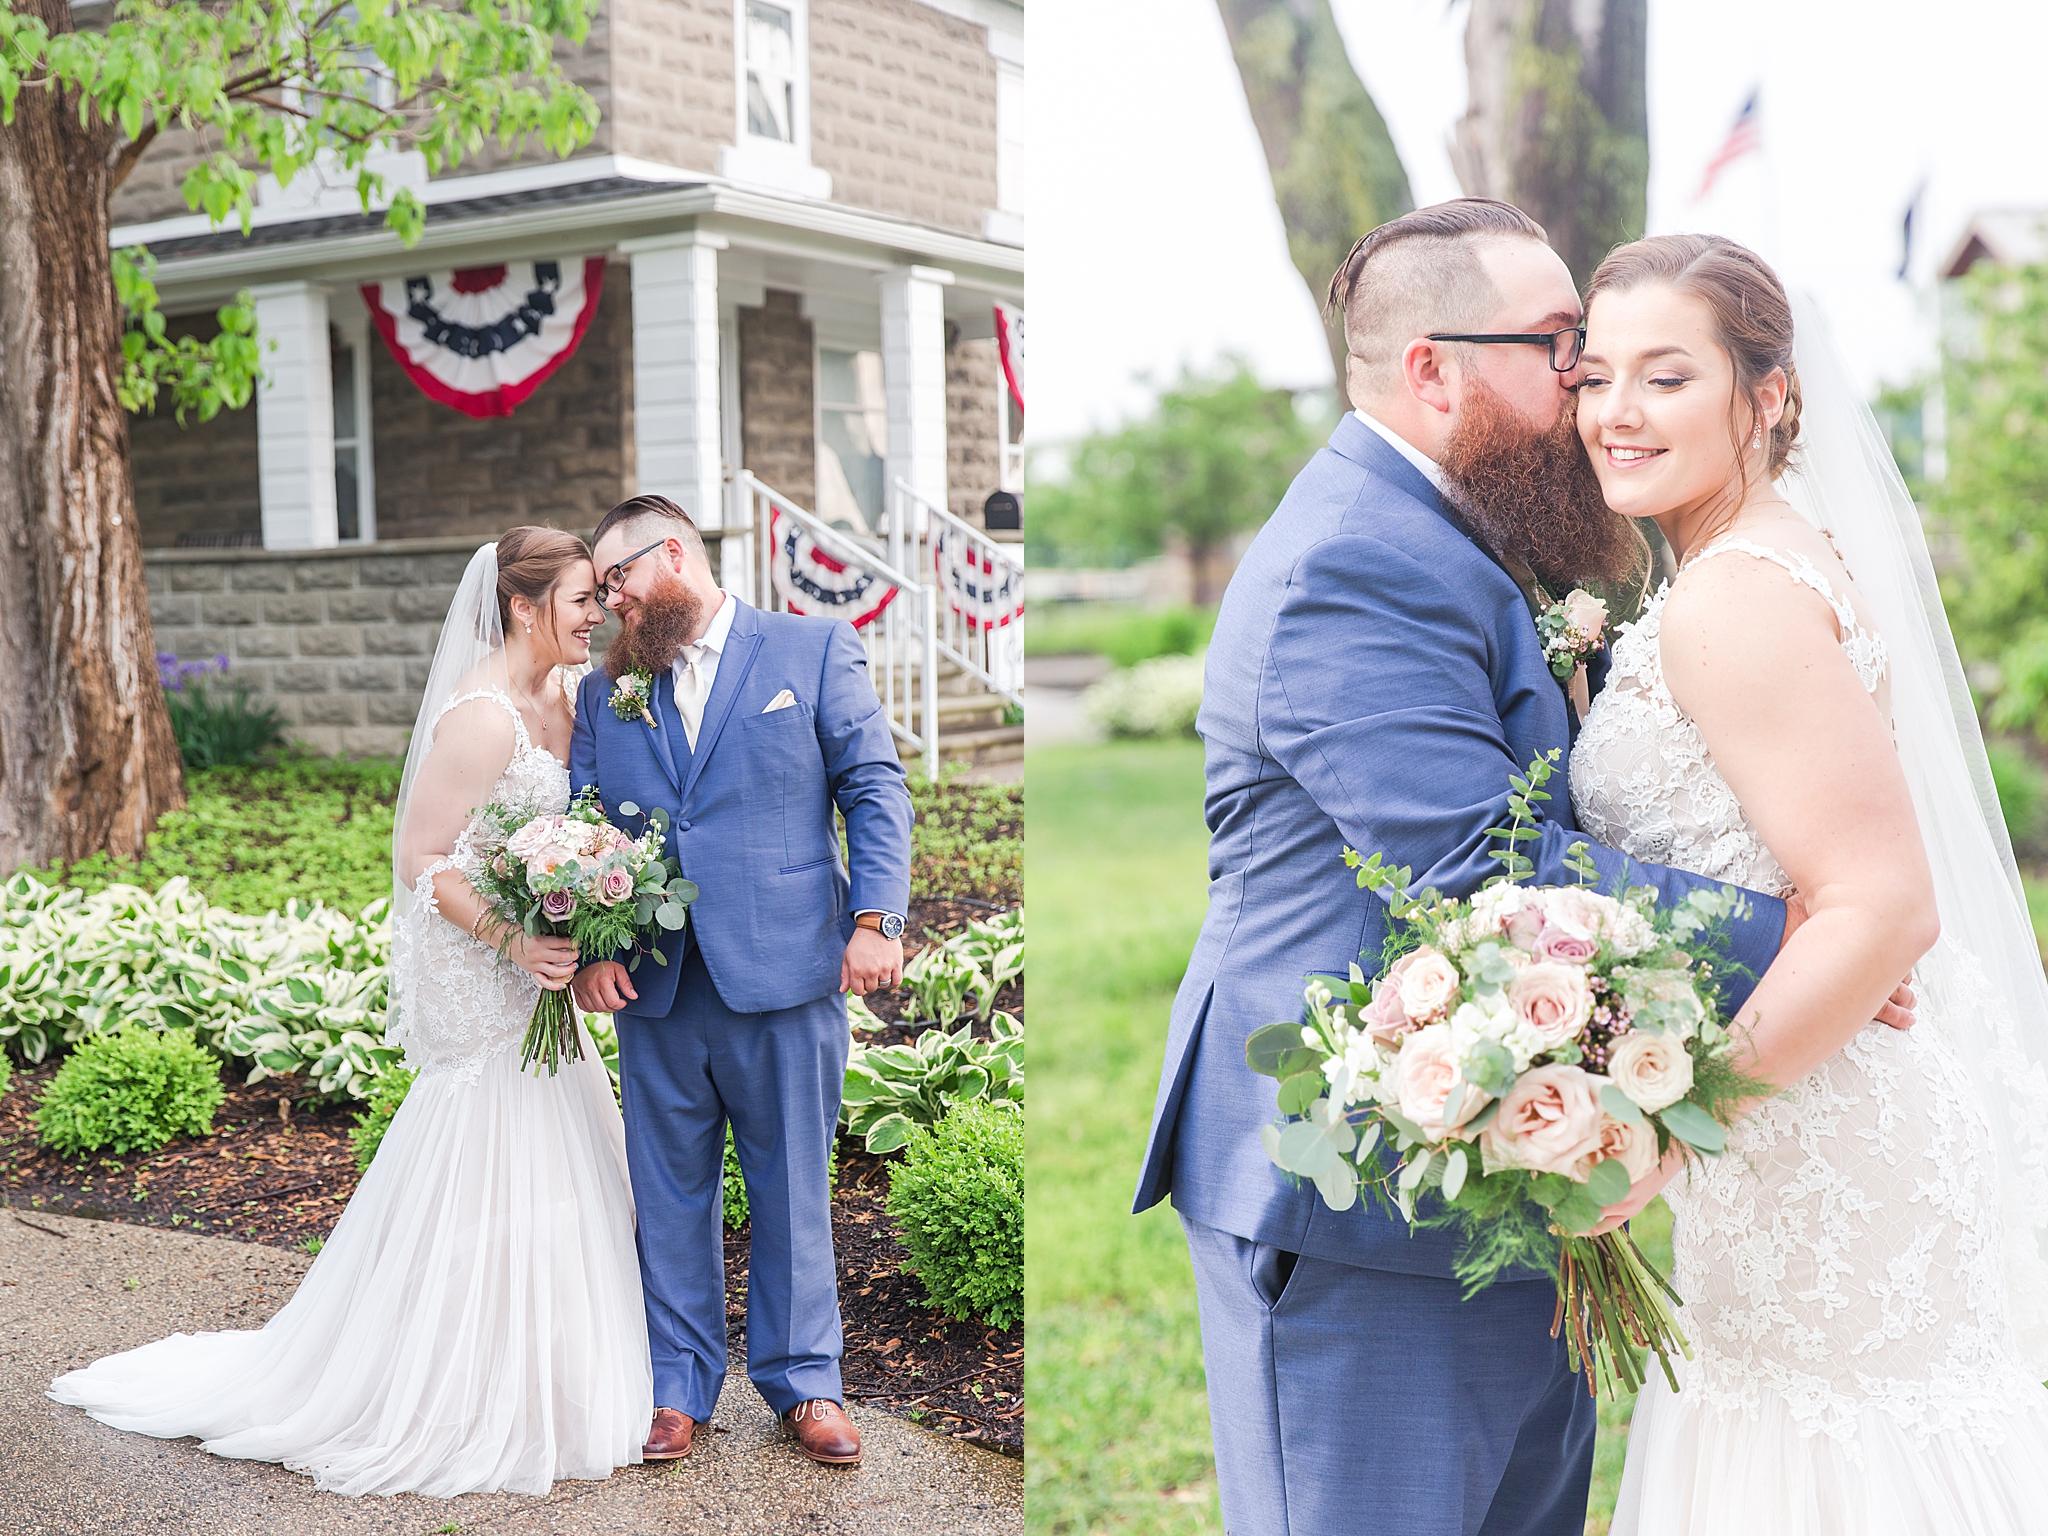 detroit-wedding-photographer-brownstown-event-center-wedding-photos-sam-josh-by-courtney-carolyn-photography_0046.jpg